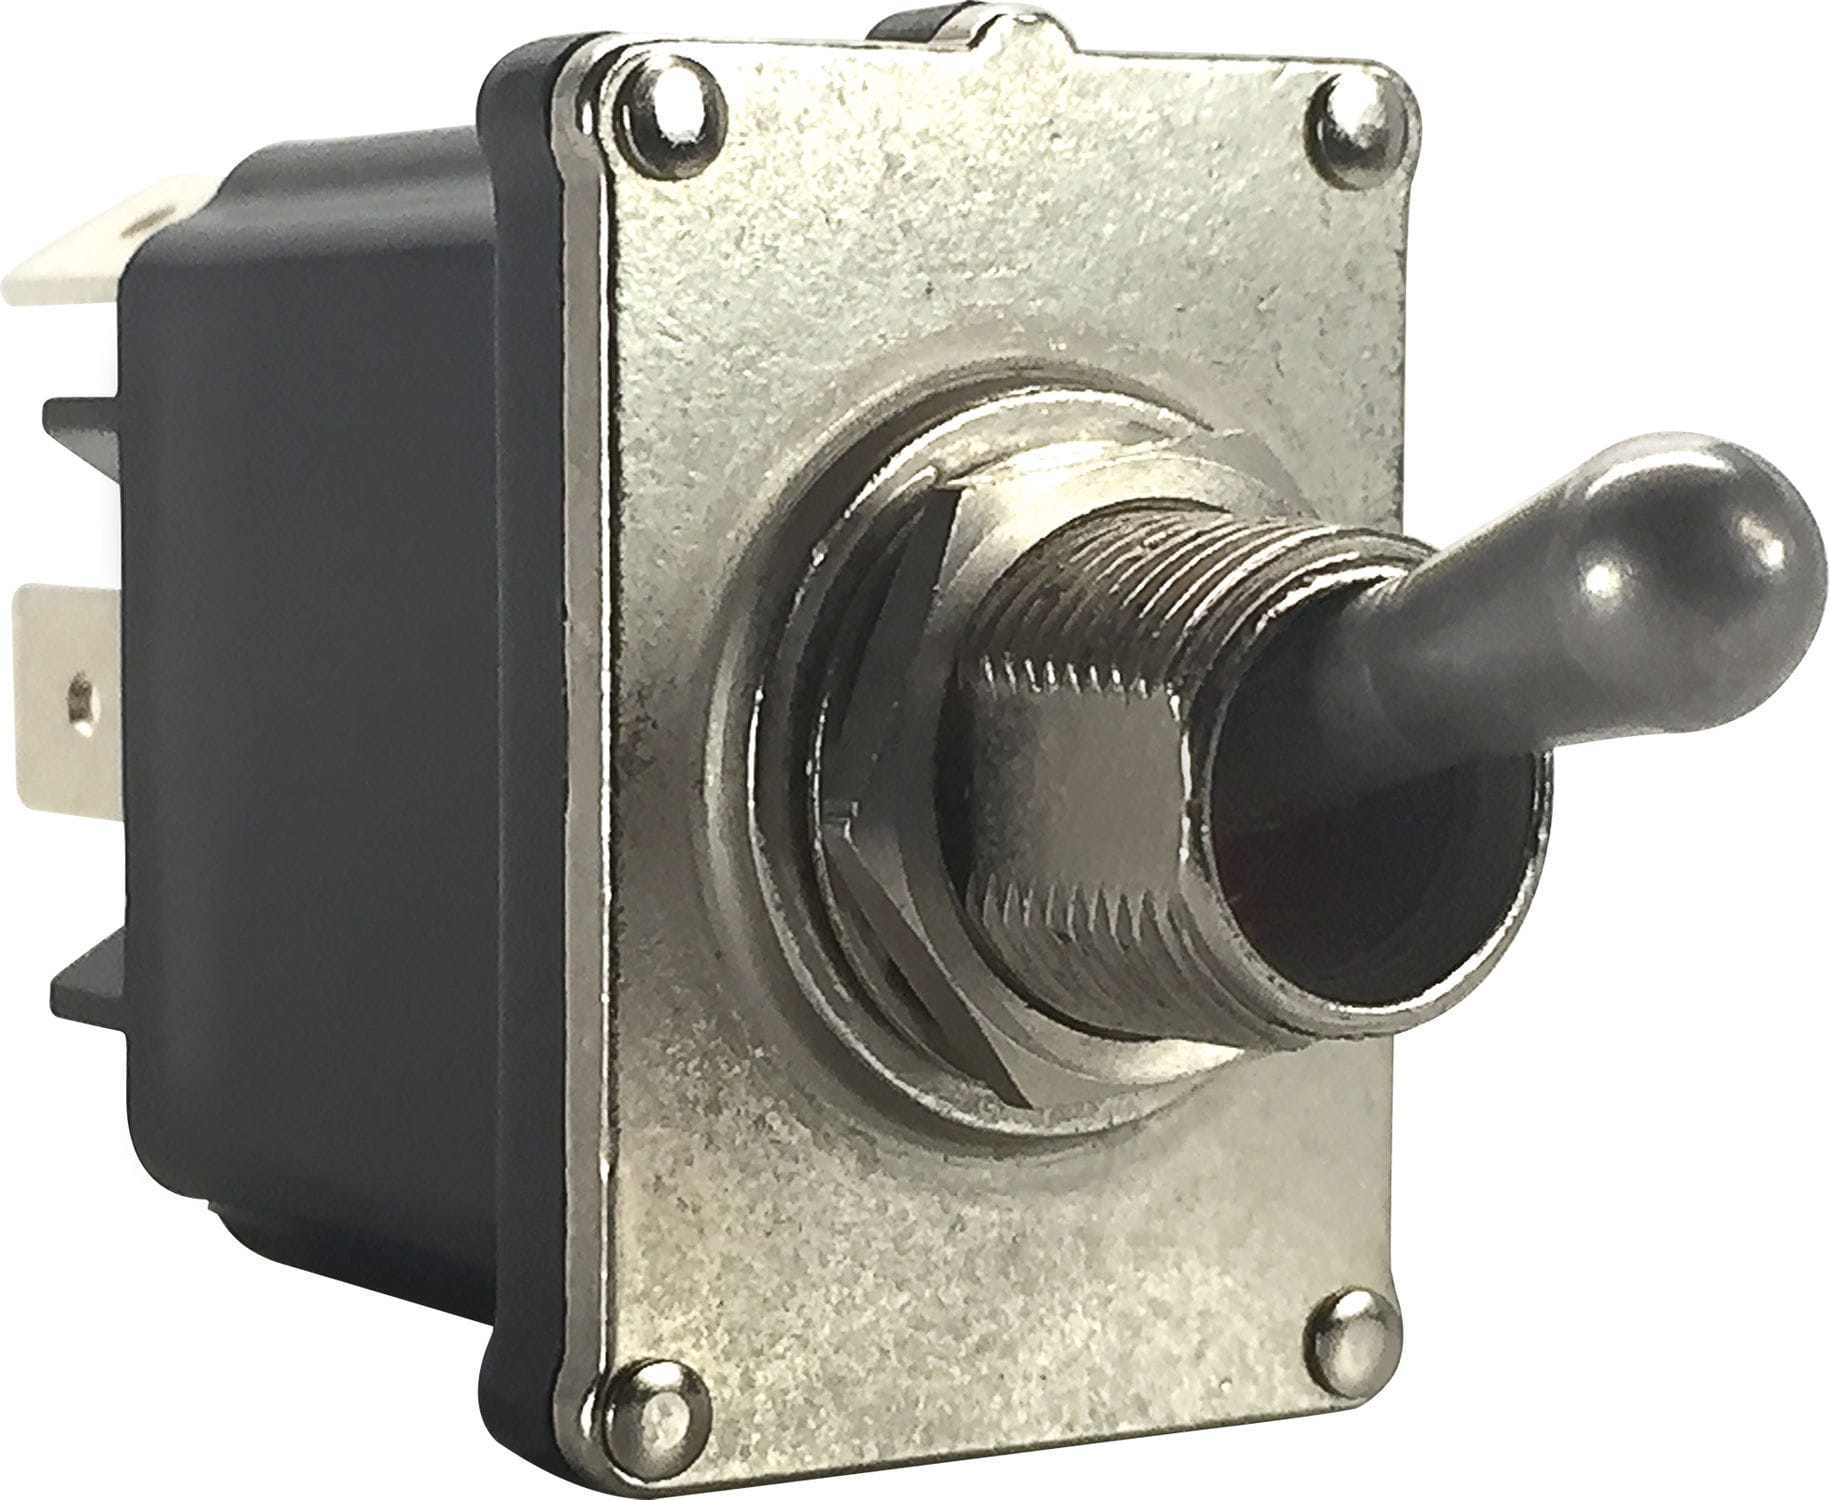 Kippschalter / zweipolig / elektromechanisch / IP68 - ST-series ...